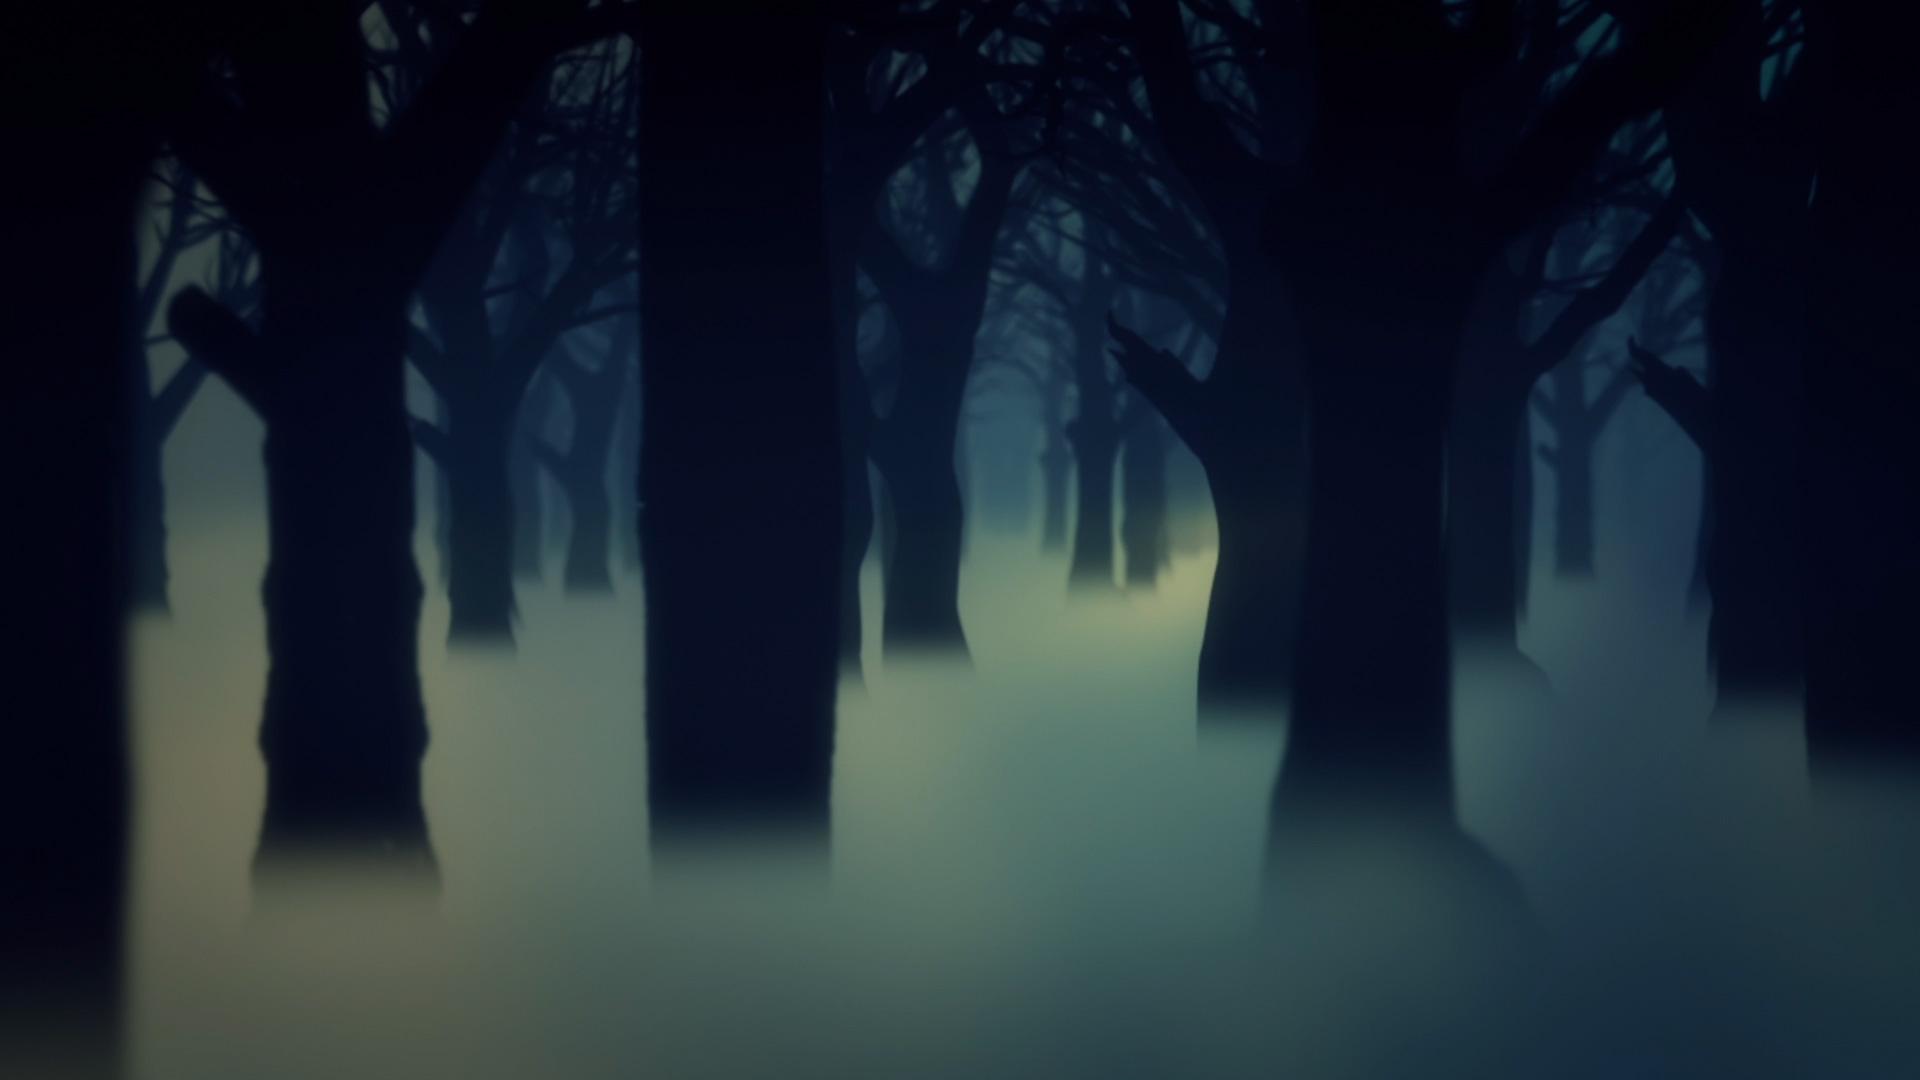 3d Action Wallpaper Hd Dark Forest Fog 3d Model Animated Pixelboom